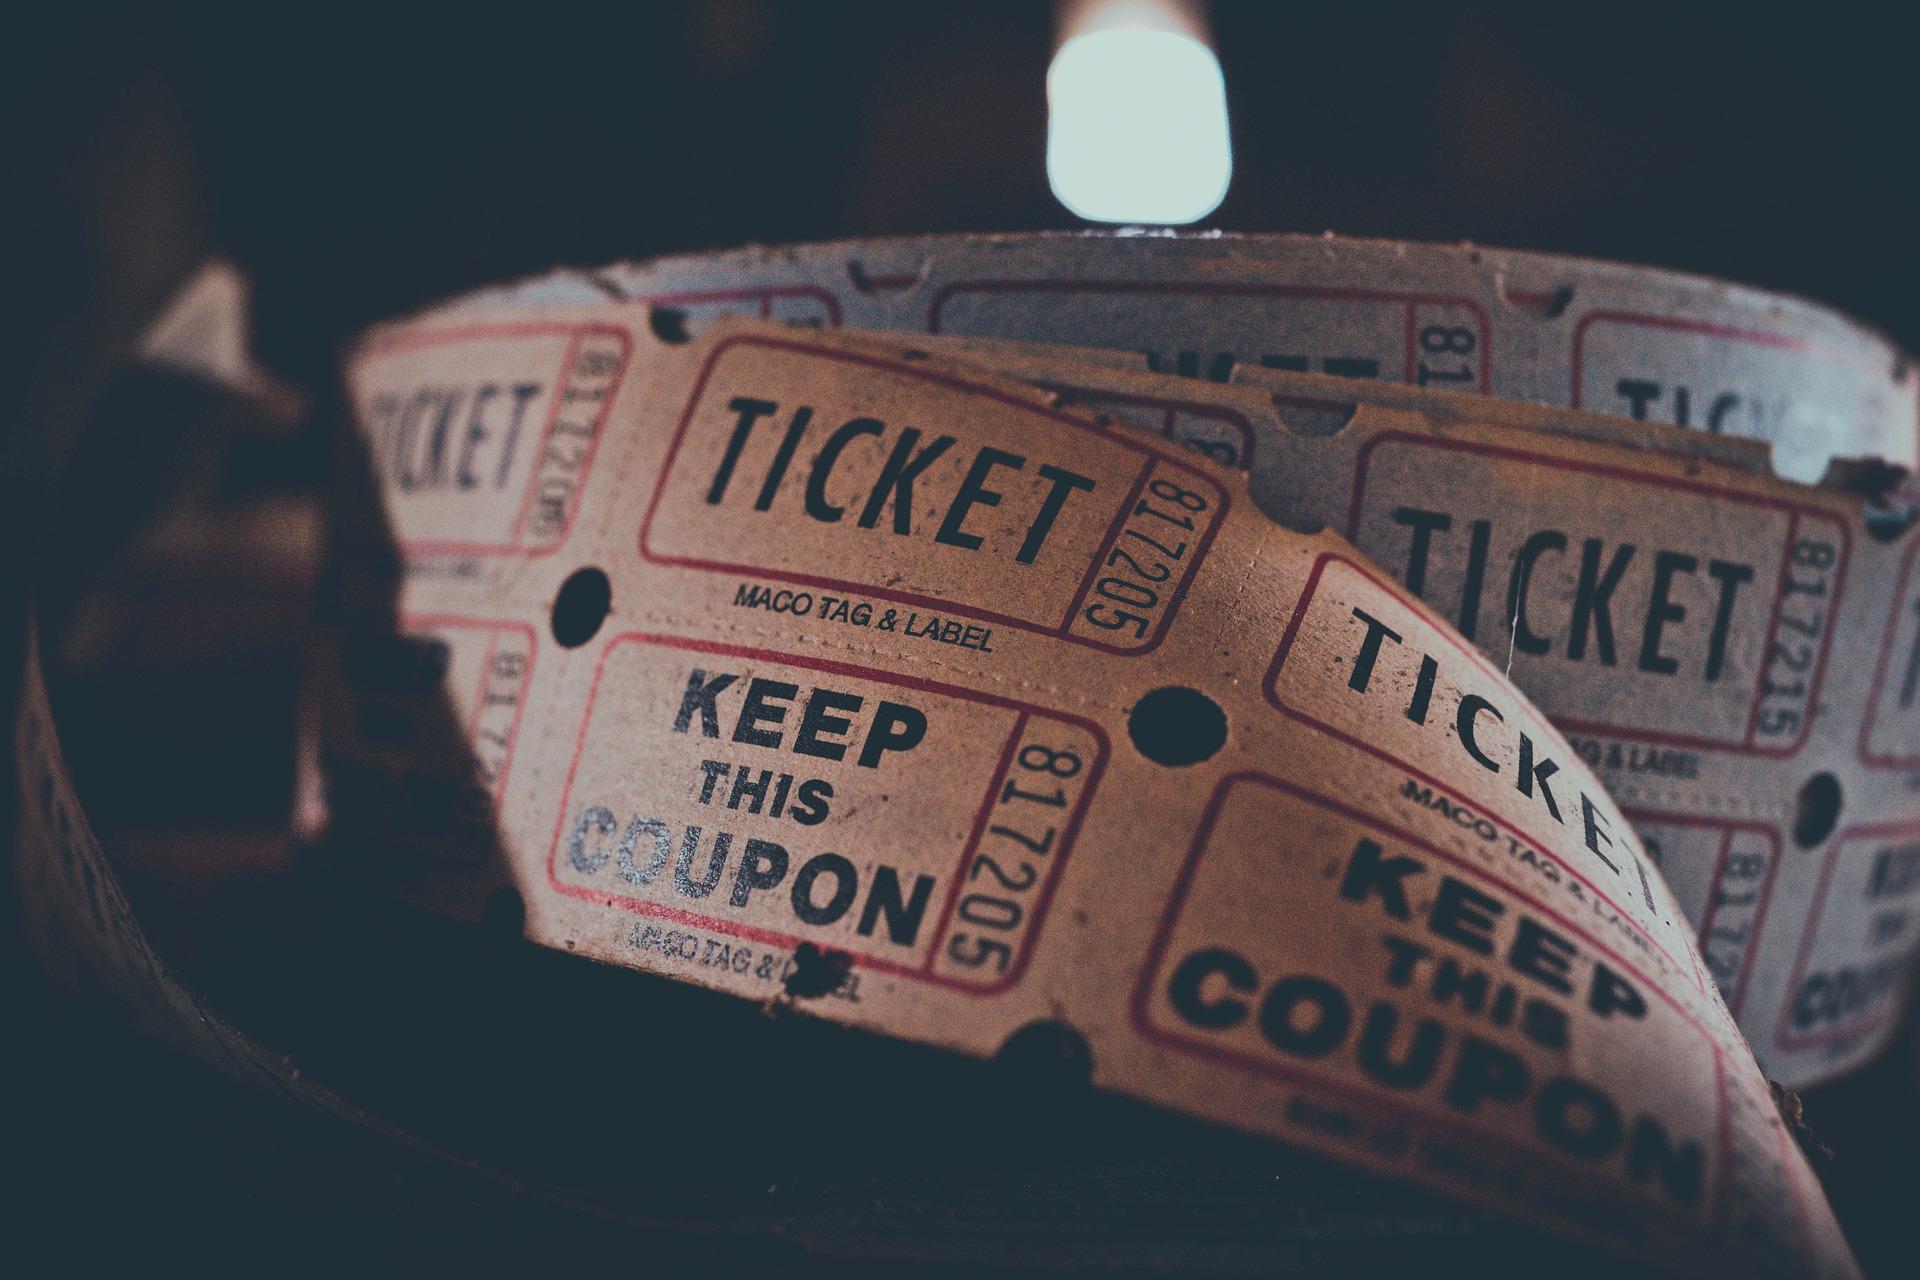 Use Movies Anywhere to Take Advantage of Bargains - TidBITS